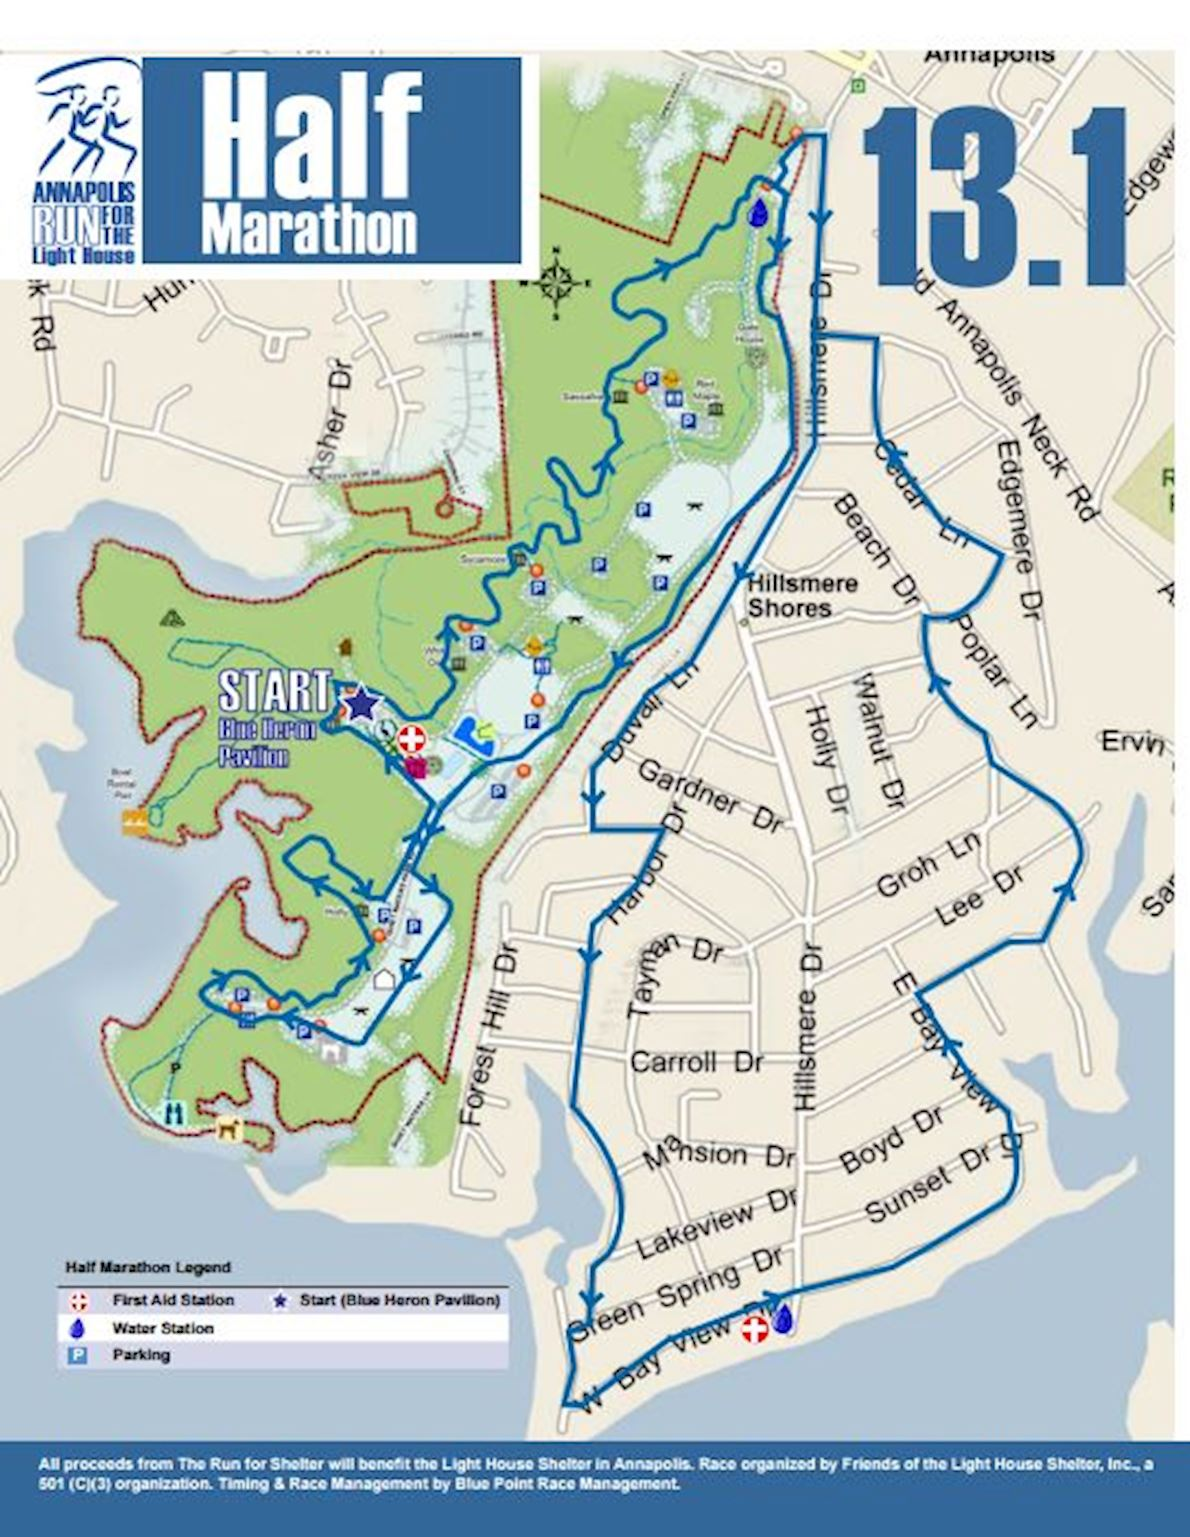 Annapolis Run for the Light House Routenkarte